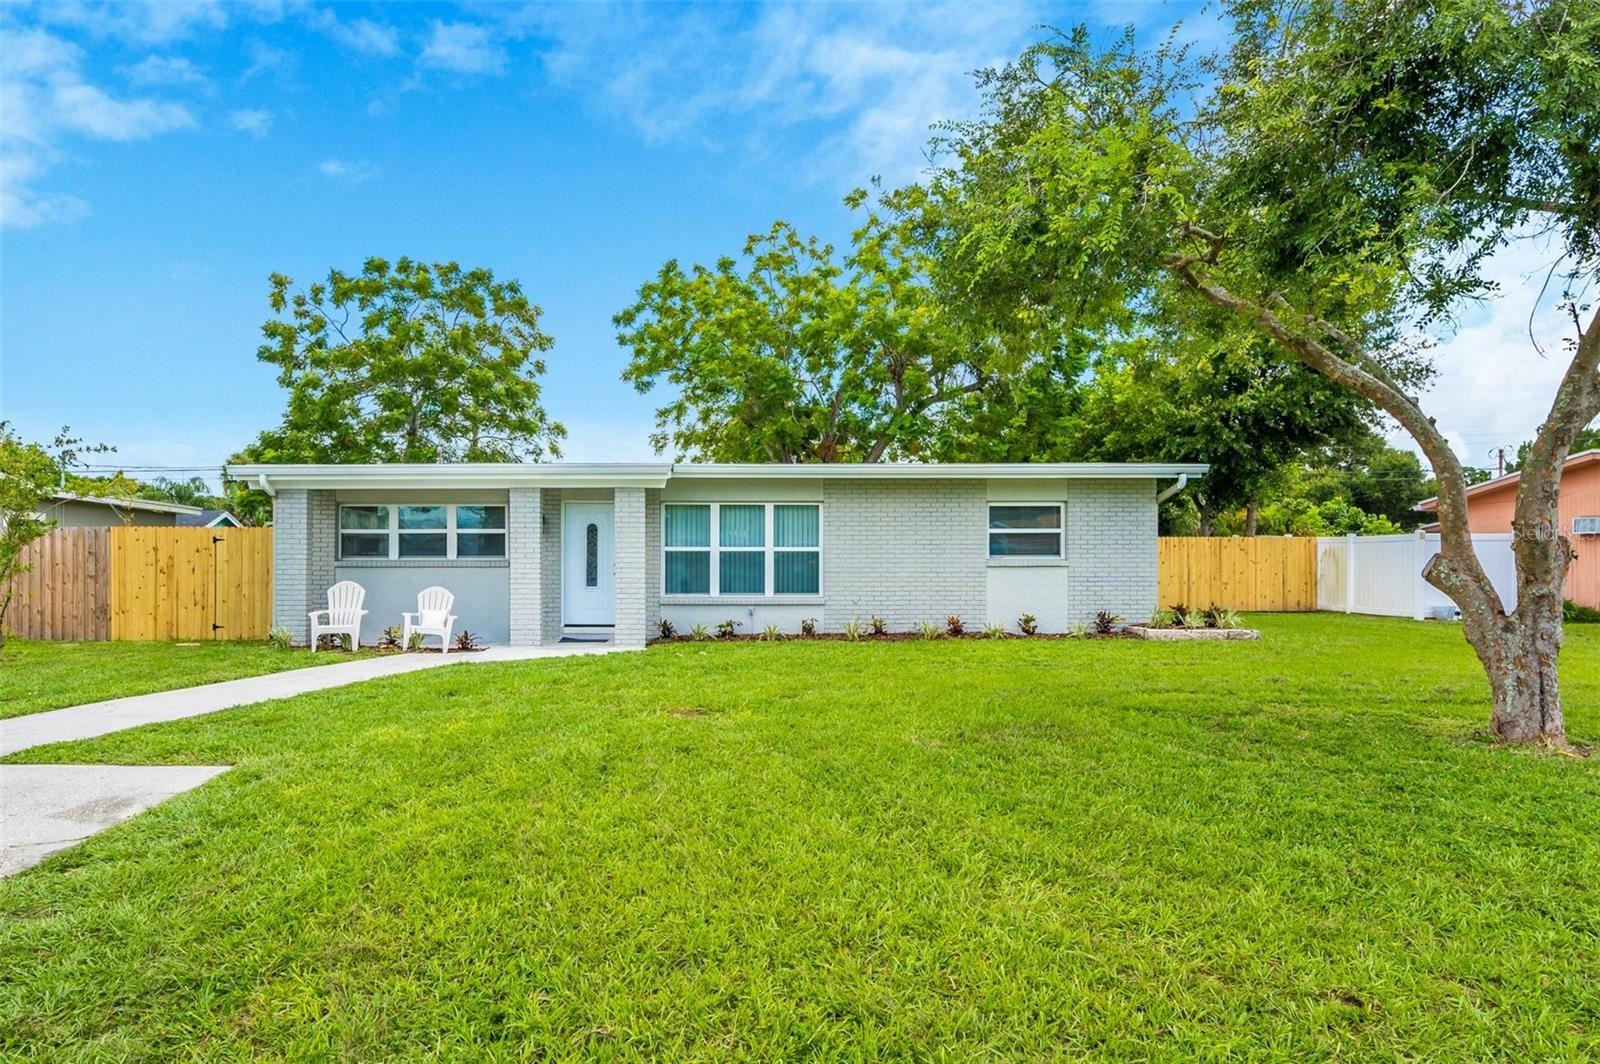 8597 QUAIL ROAD, Seminole, FL 33777 - #: U8130997